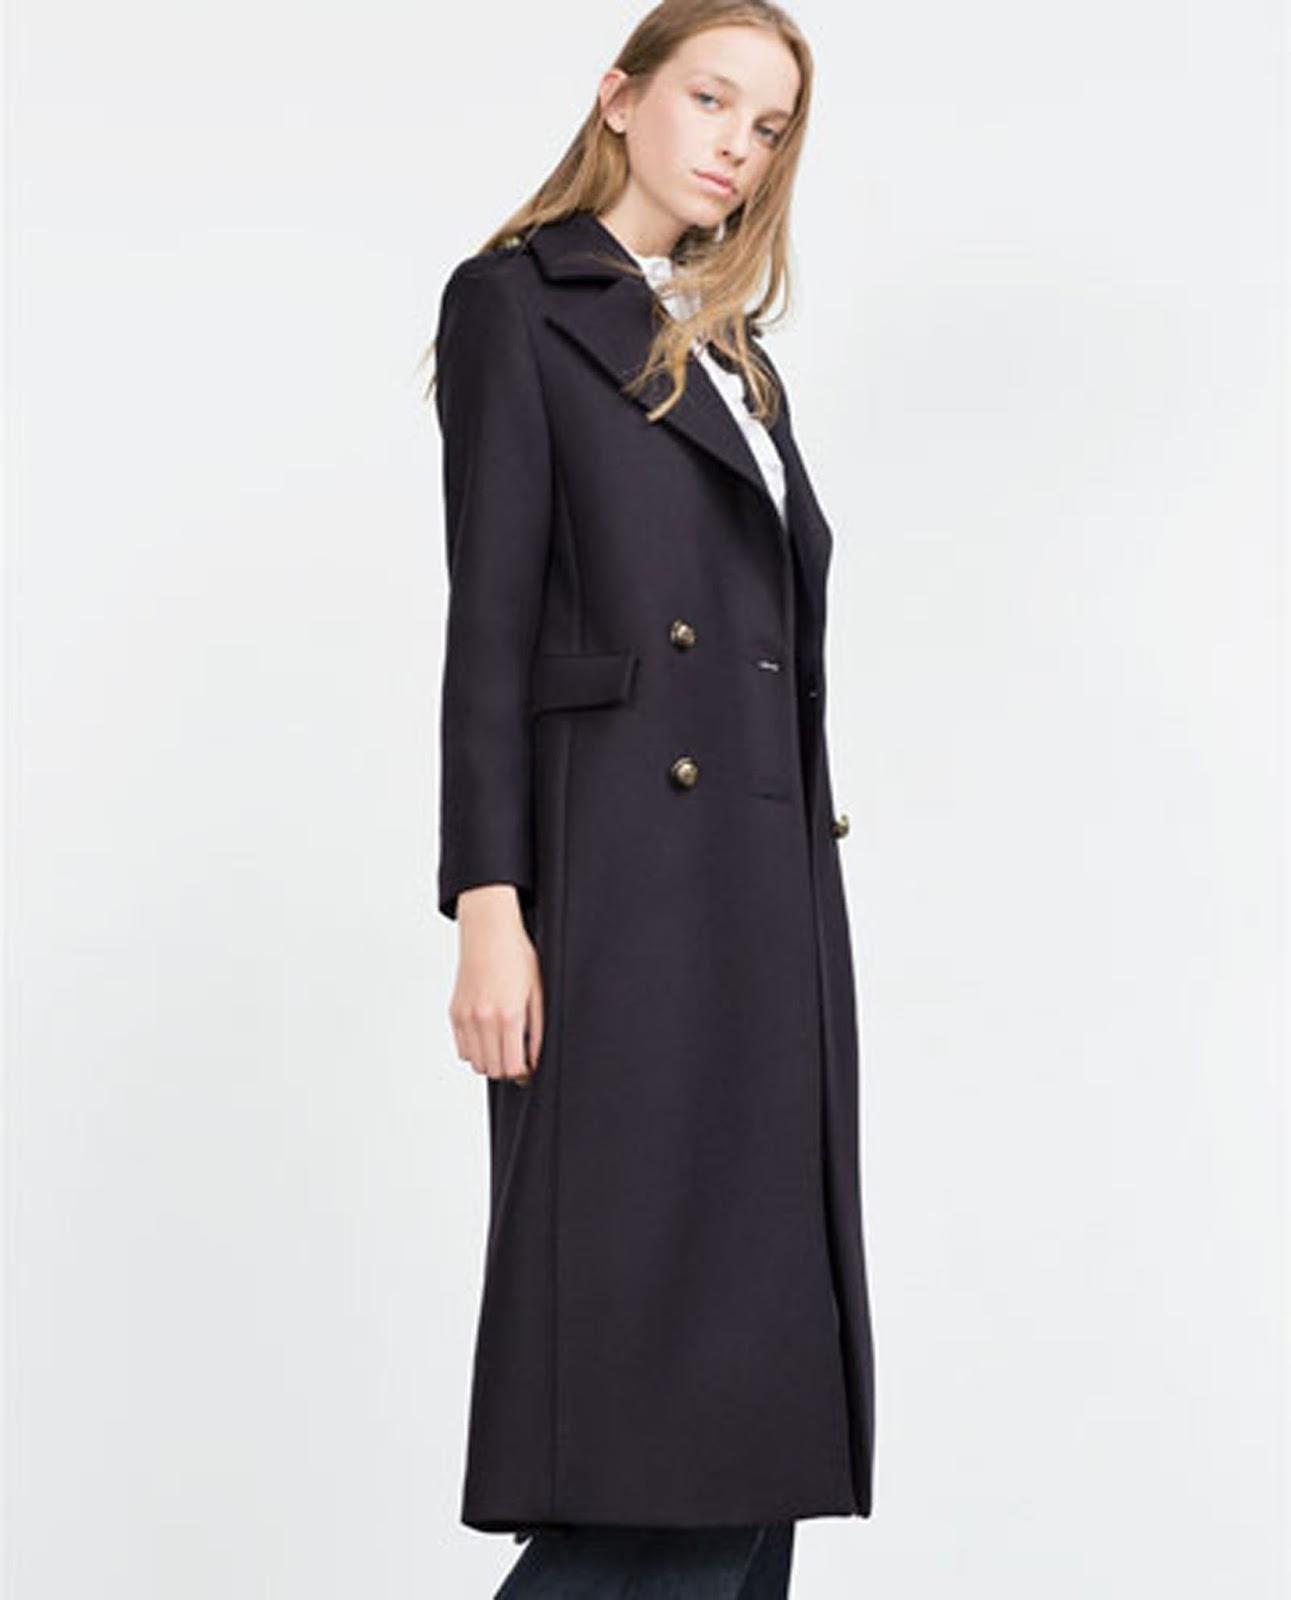 Eniwhere Fashion - Zara's Wishlist - Natale - coat